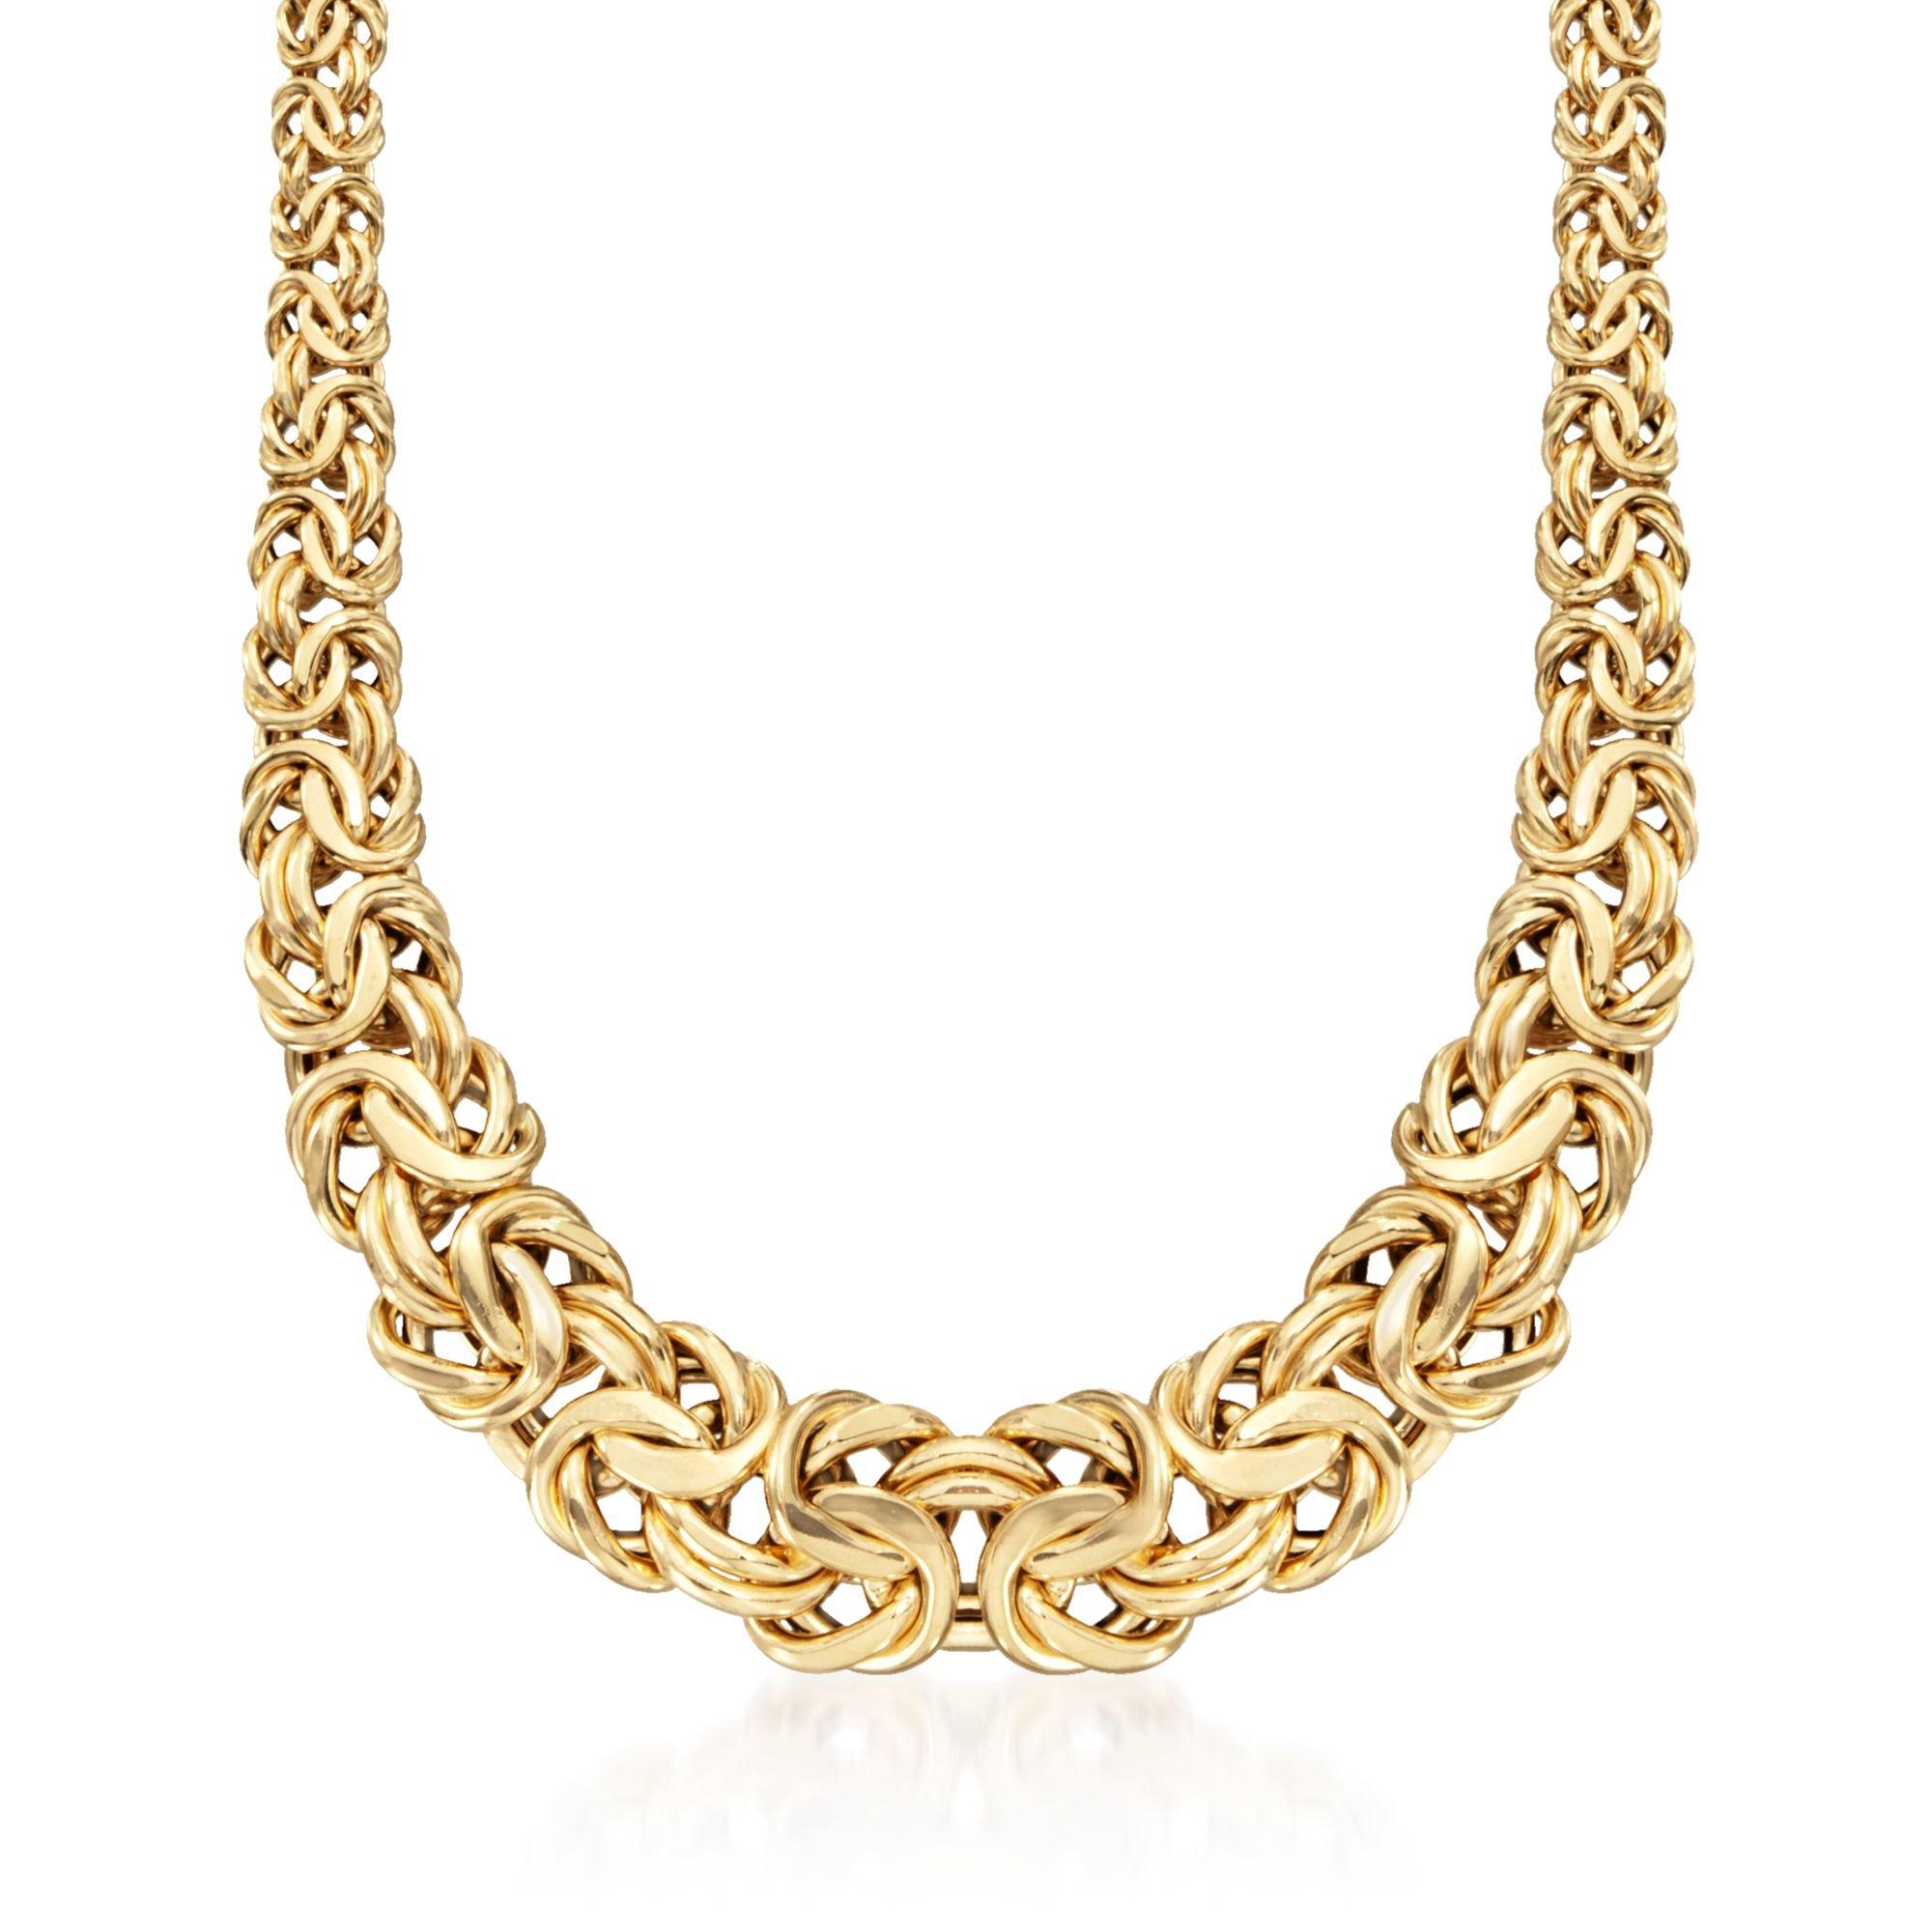 Ross-Simons Italian 18kt Yellow Gold Graduated Byzantine Necklace